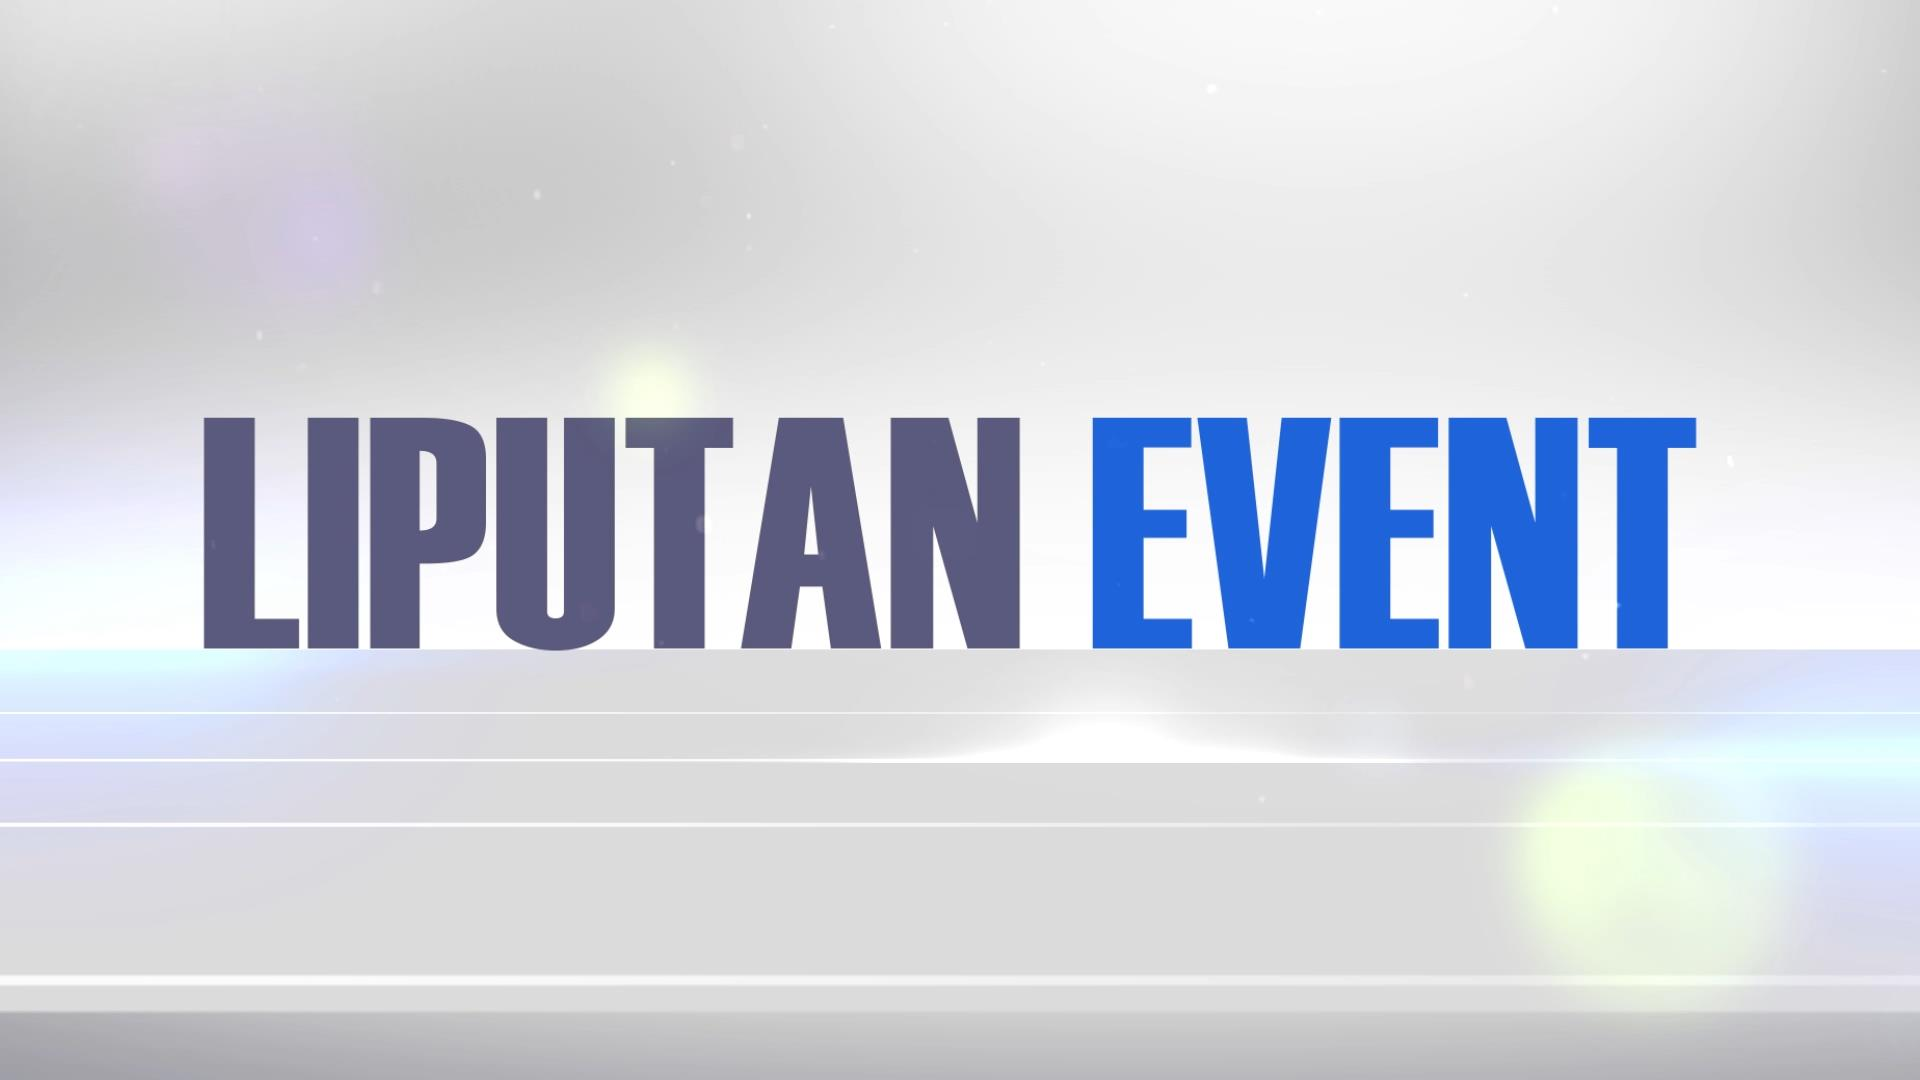 LIPUTAN EVENT